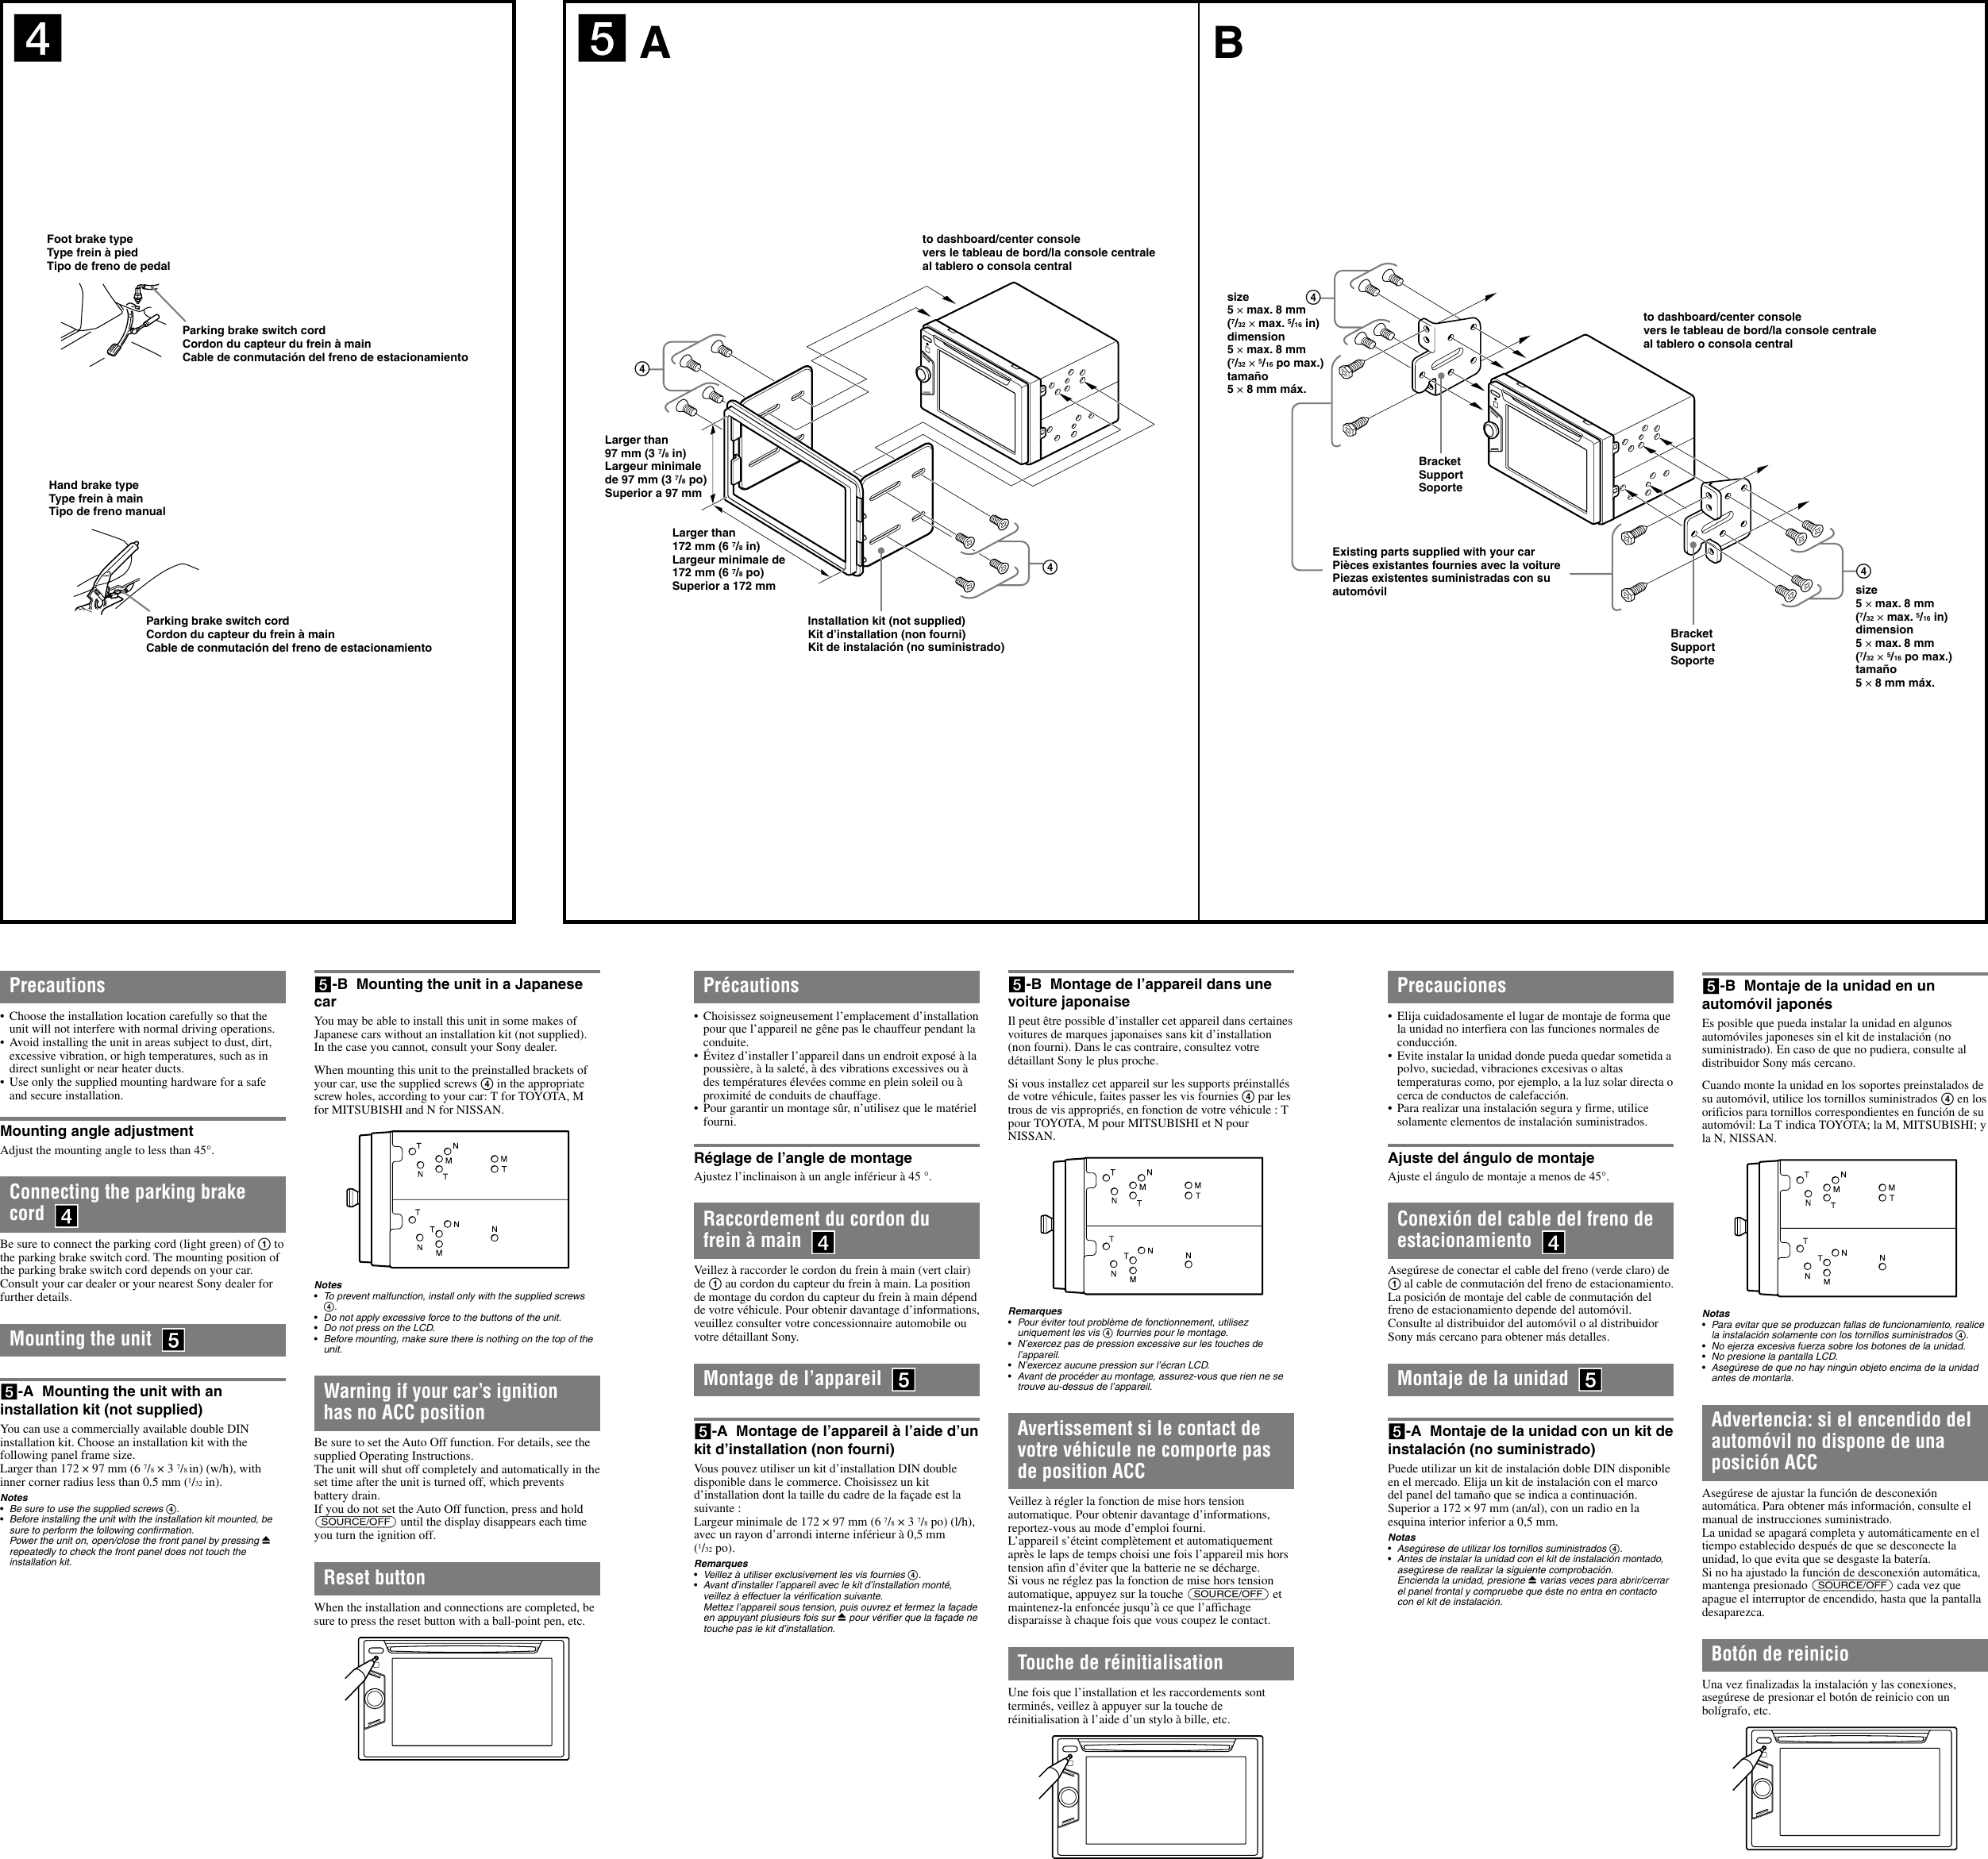 XC_2038] Sony Xav 70Bt Wiring Diagram Wiring Diagram | Car Audio Wiring Diagram Sony Xav 60 |  | Embo Unec Lectr Phae Mohammedshrine Librar Wiring 101